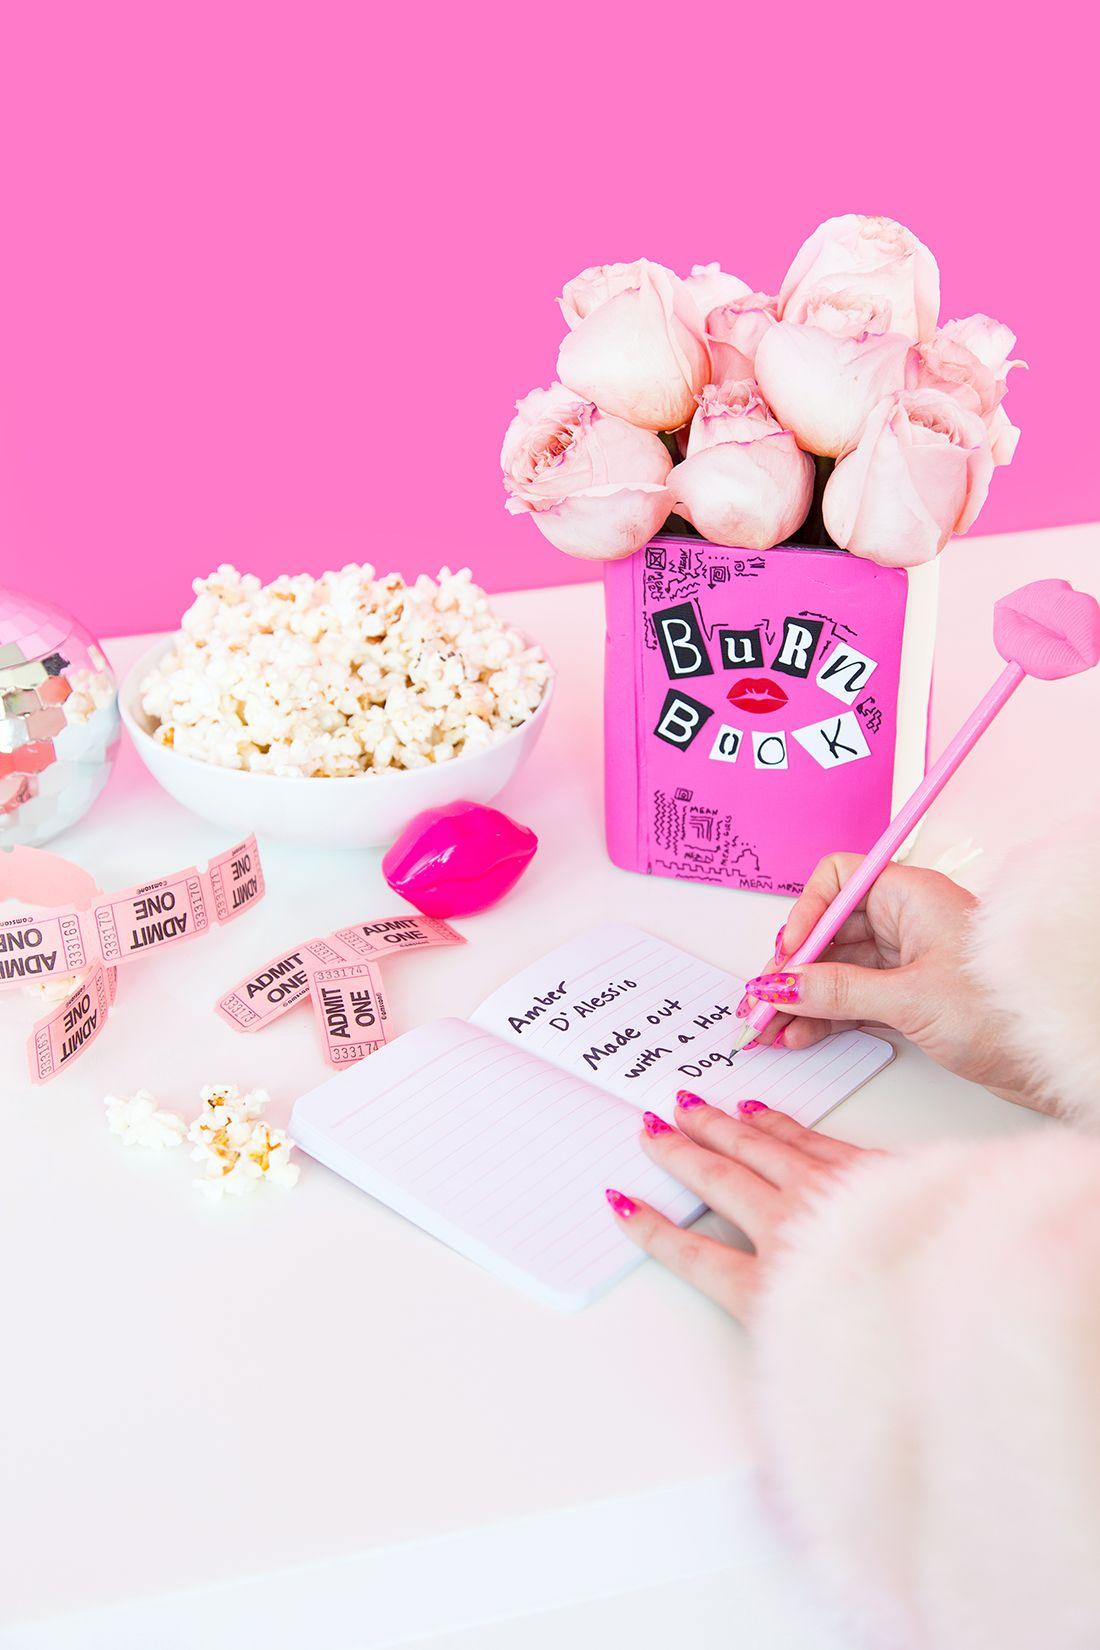 Movie Night! DIY Mean Girls Burn Book Vase Mean girls